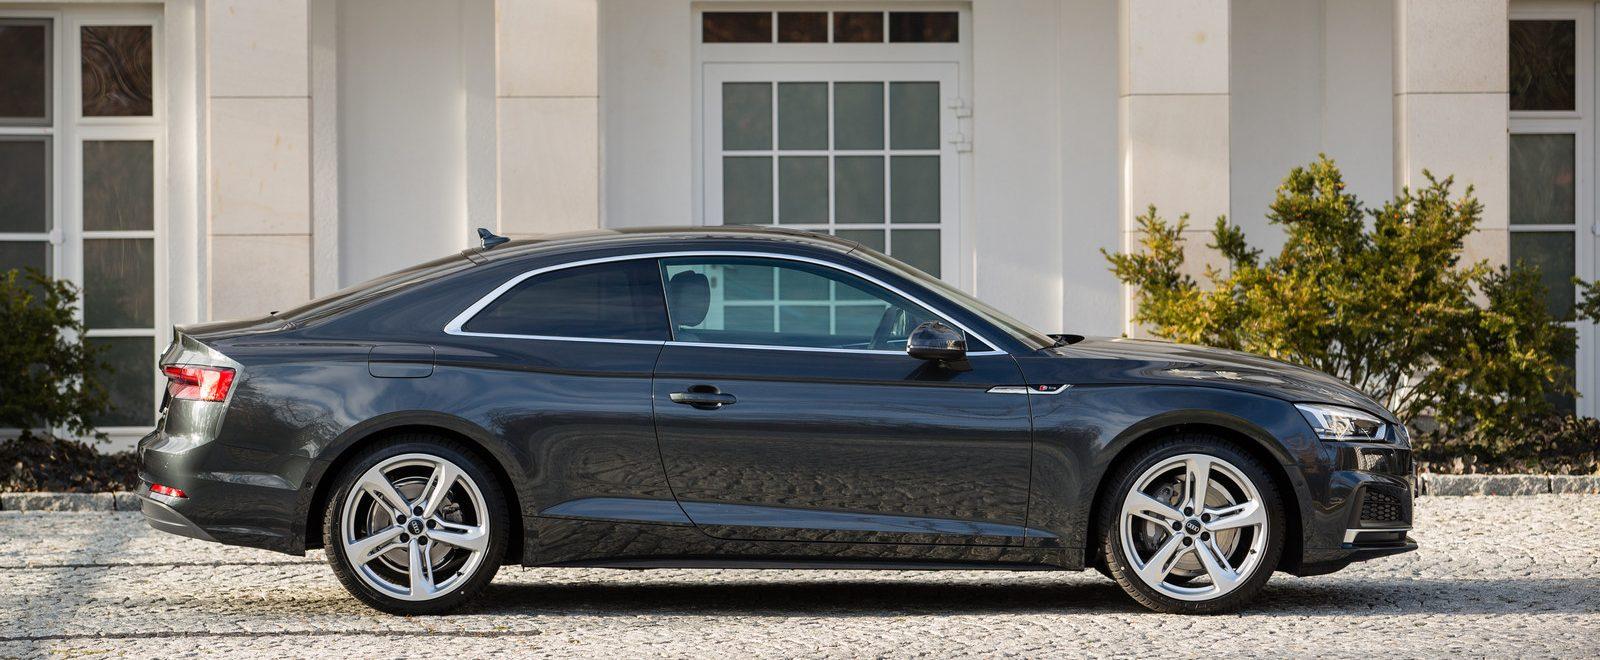 nowe-audi-a5-coupe-polska-36